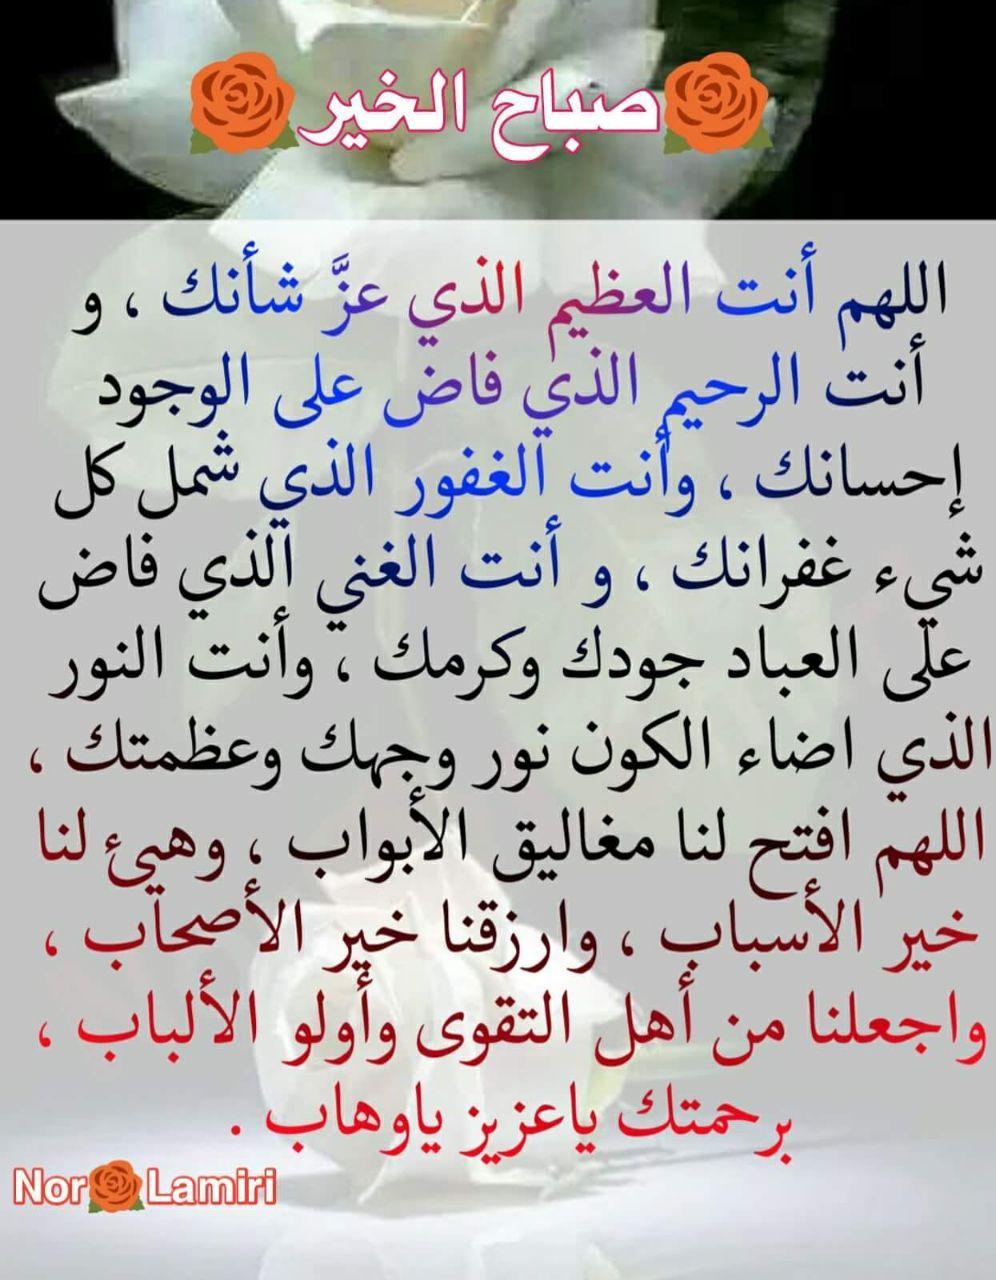 Pin By Eman B On Islam Duaa Islam Islam Islamic Quotes